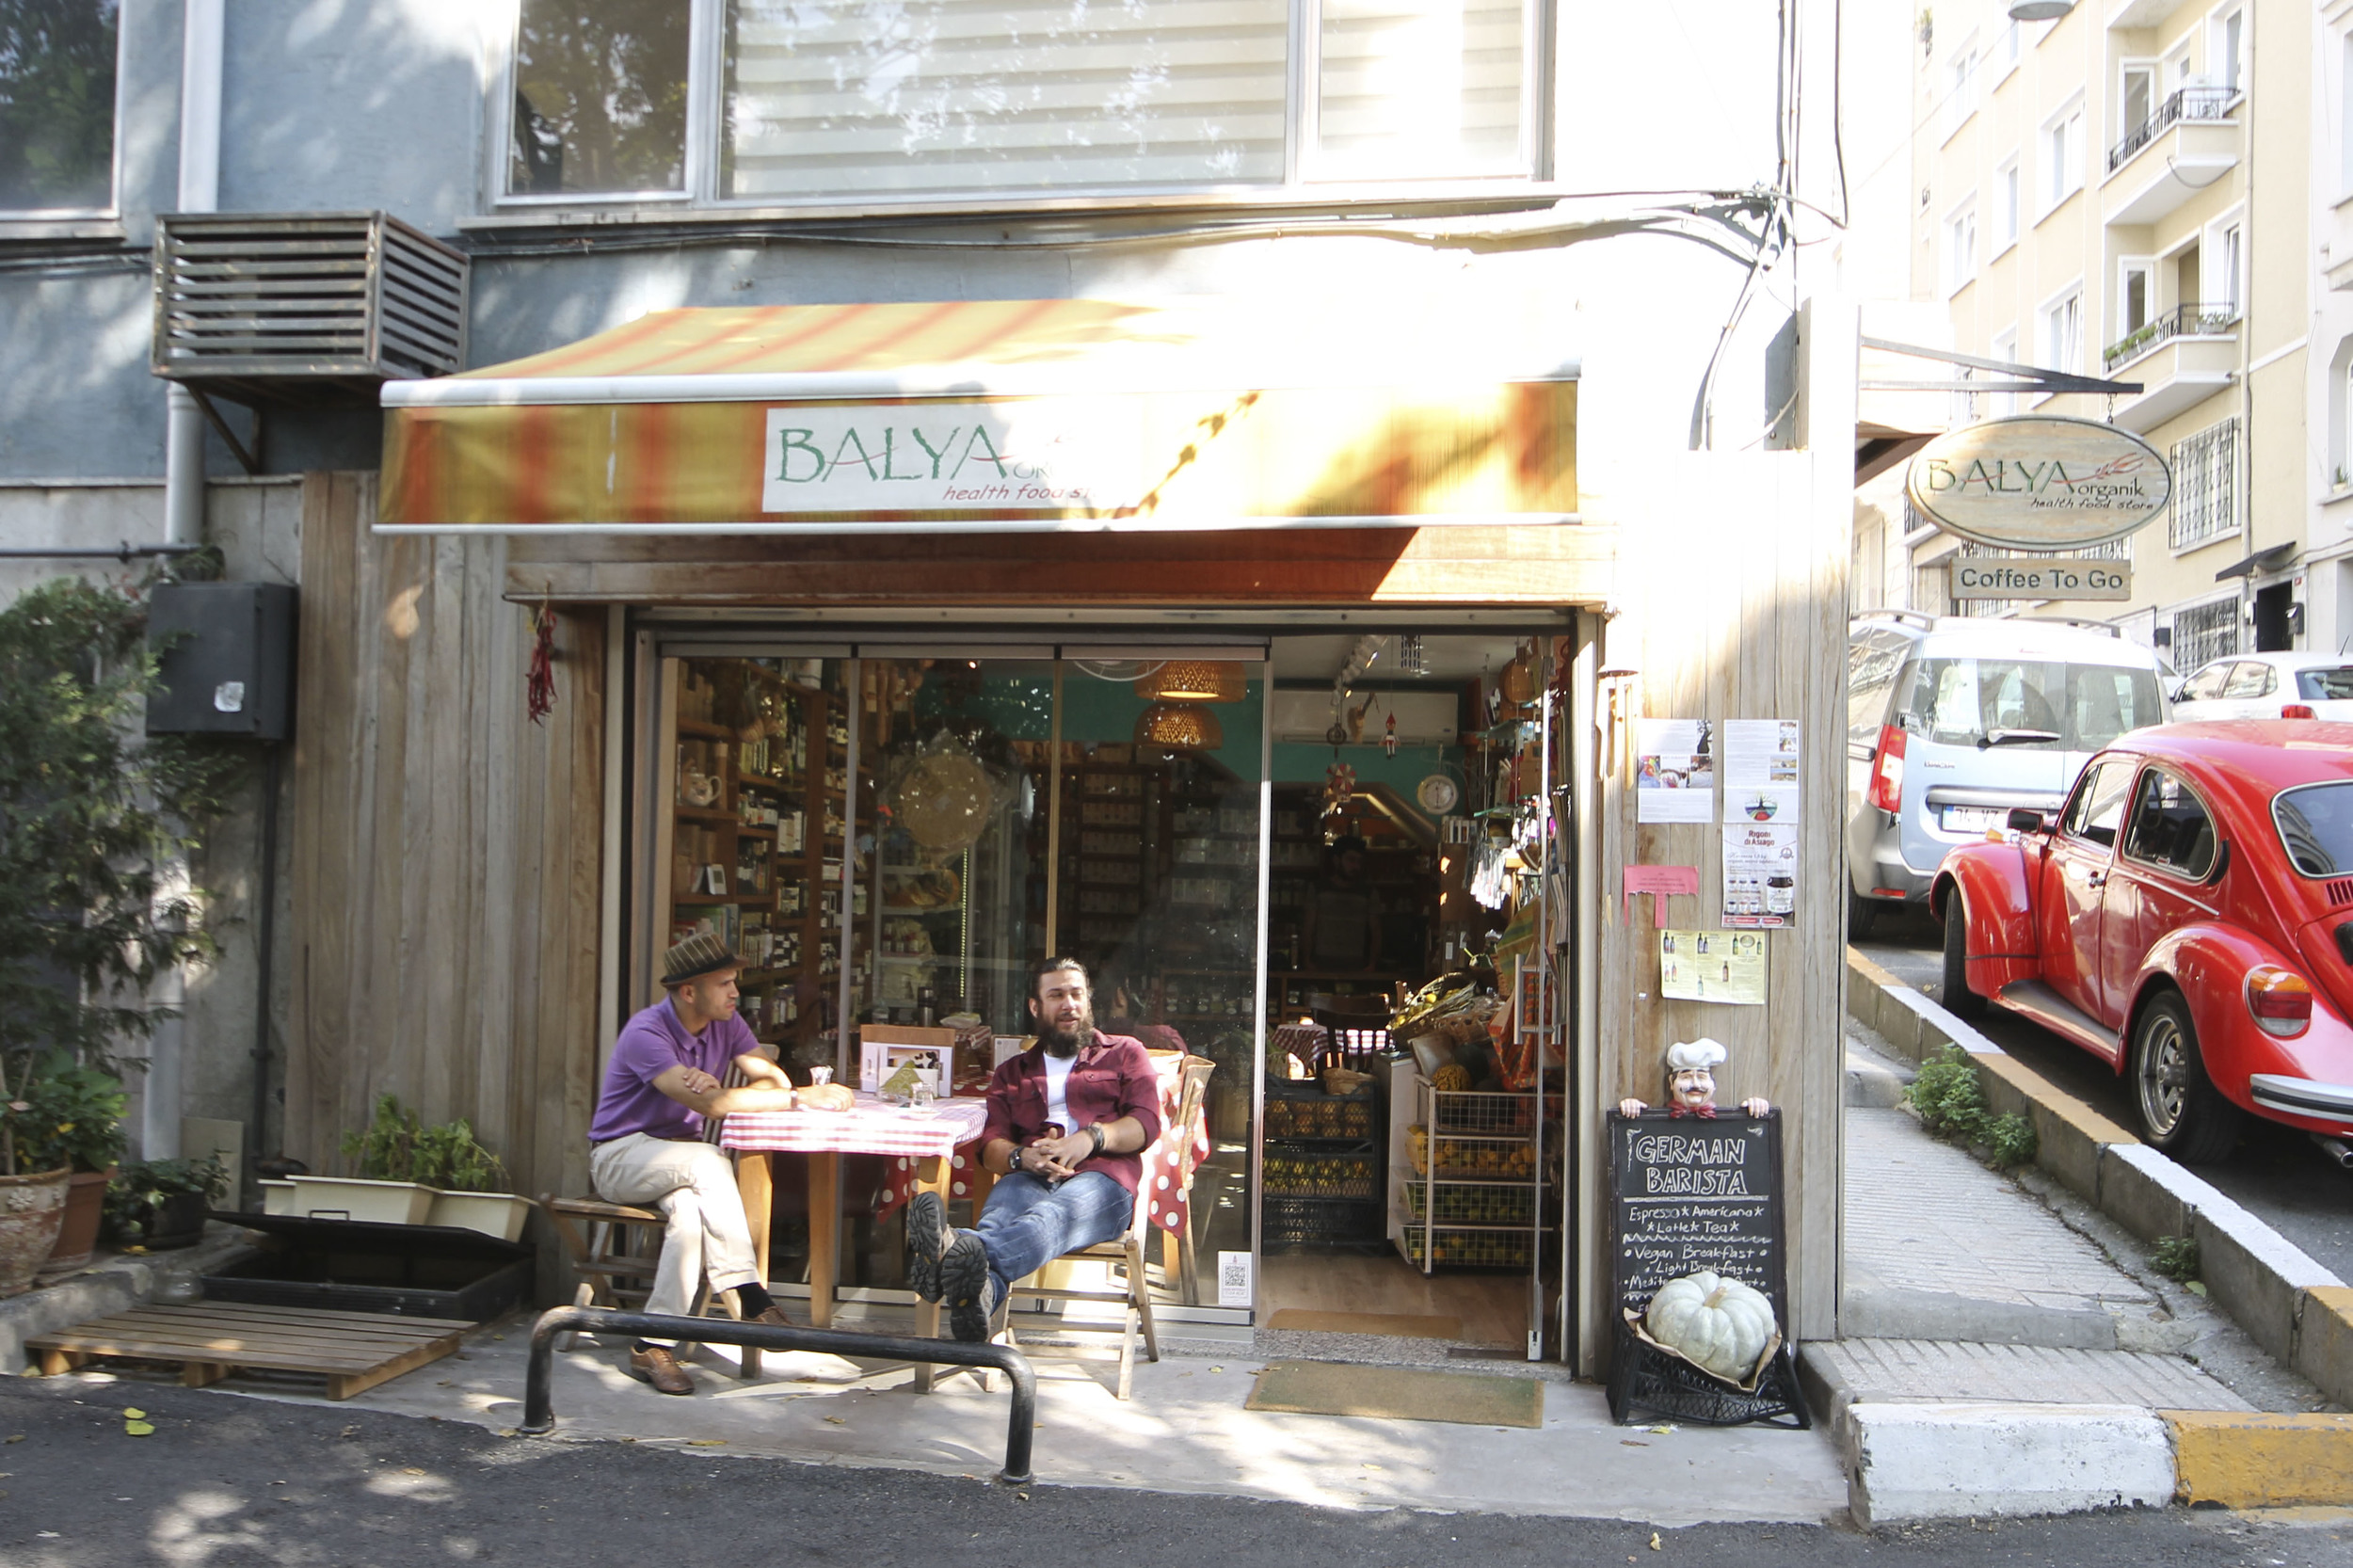 Balya oganic health food store, cihangir, istanbul2905.jpg